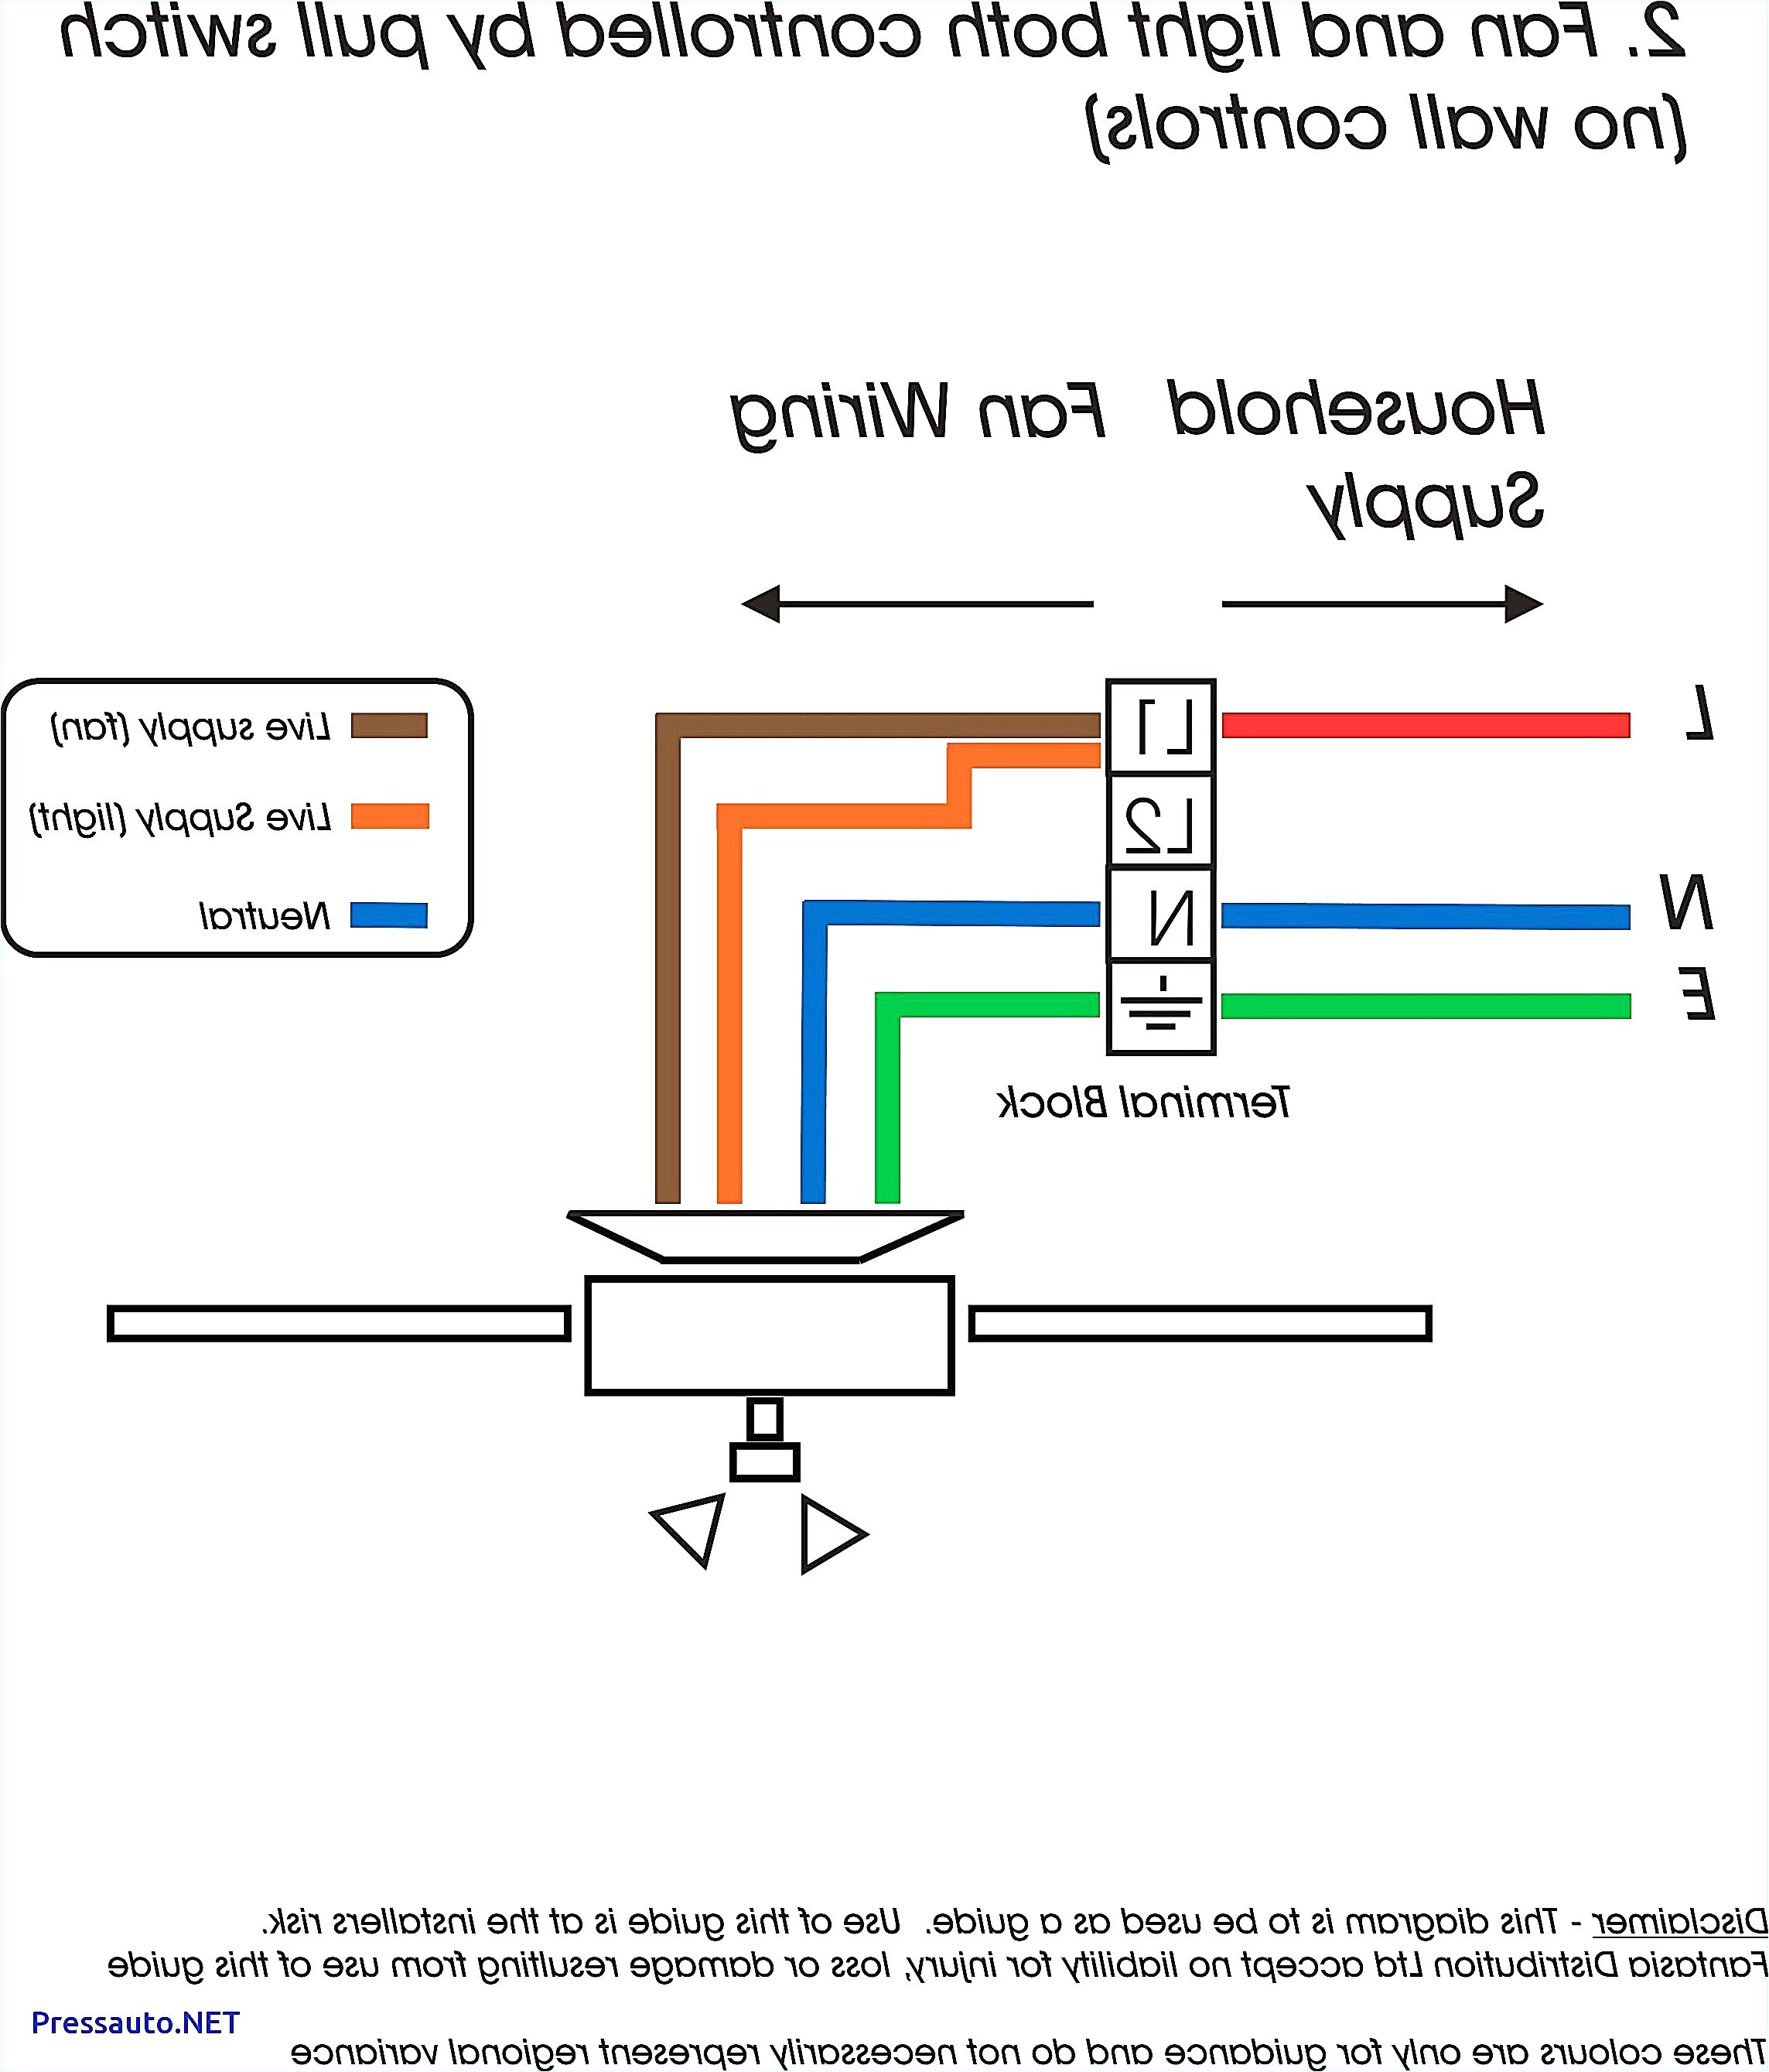 dexter trailer brakes wiring diagram best of trailer brake wiring diagram citruscyclecenter